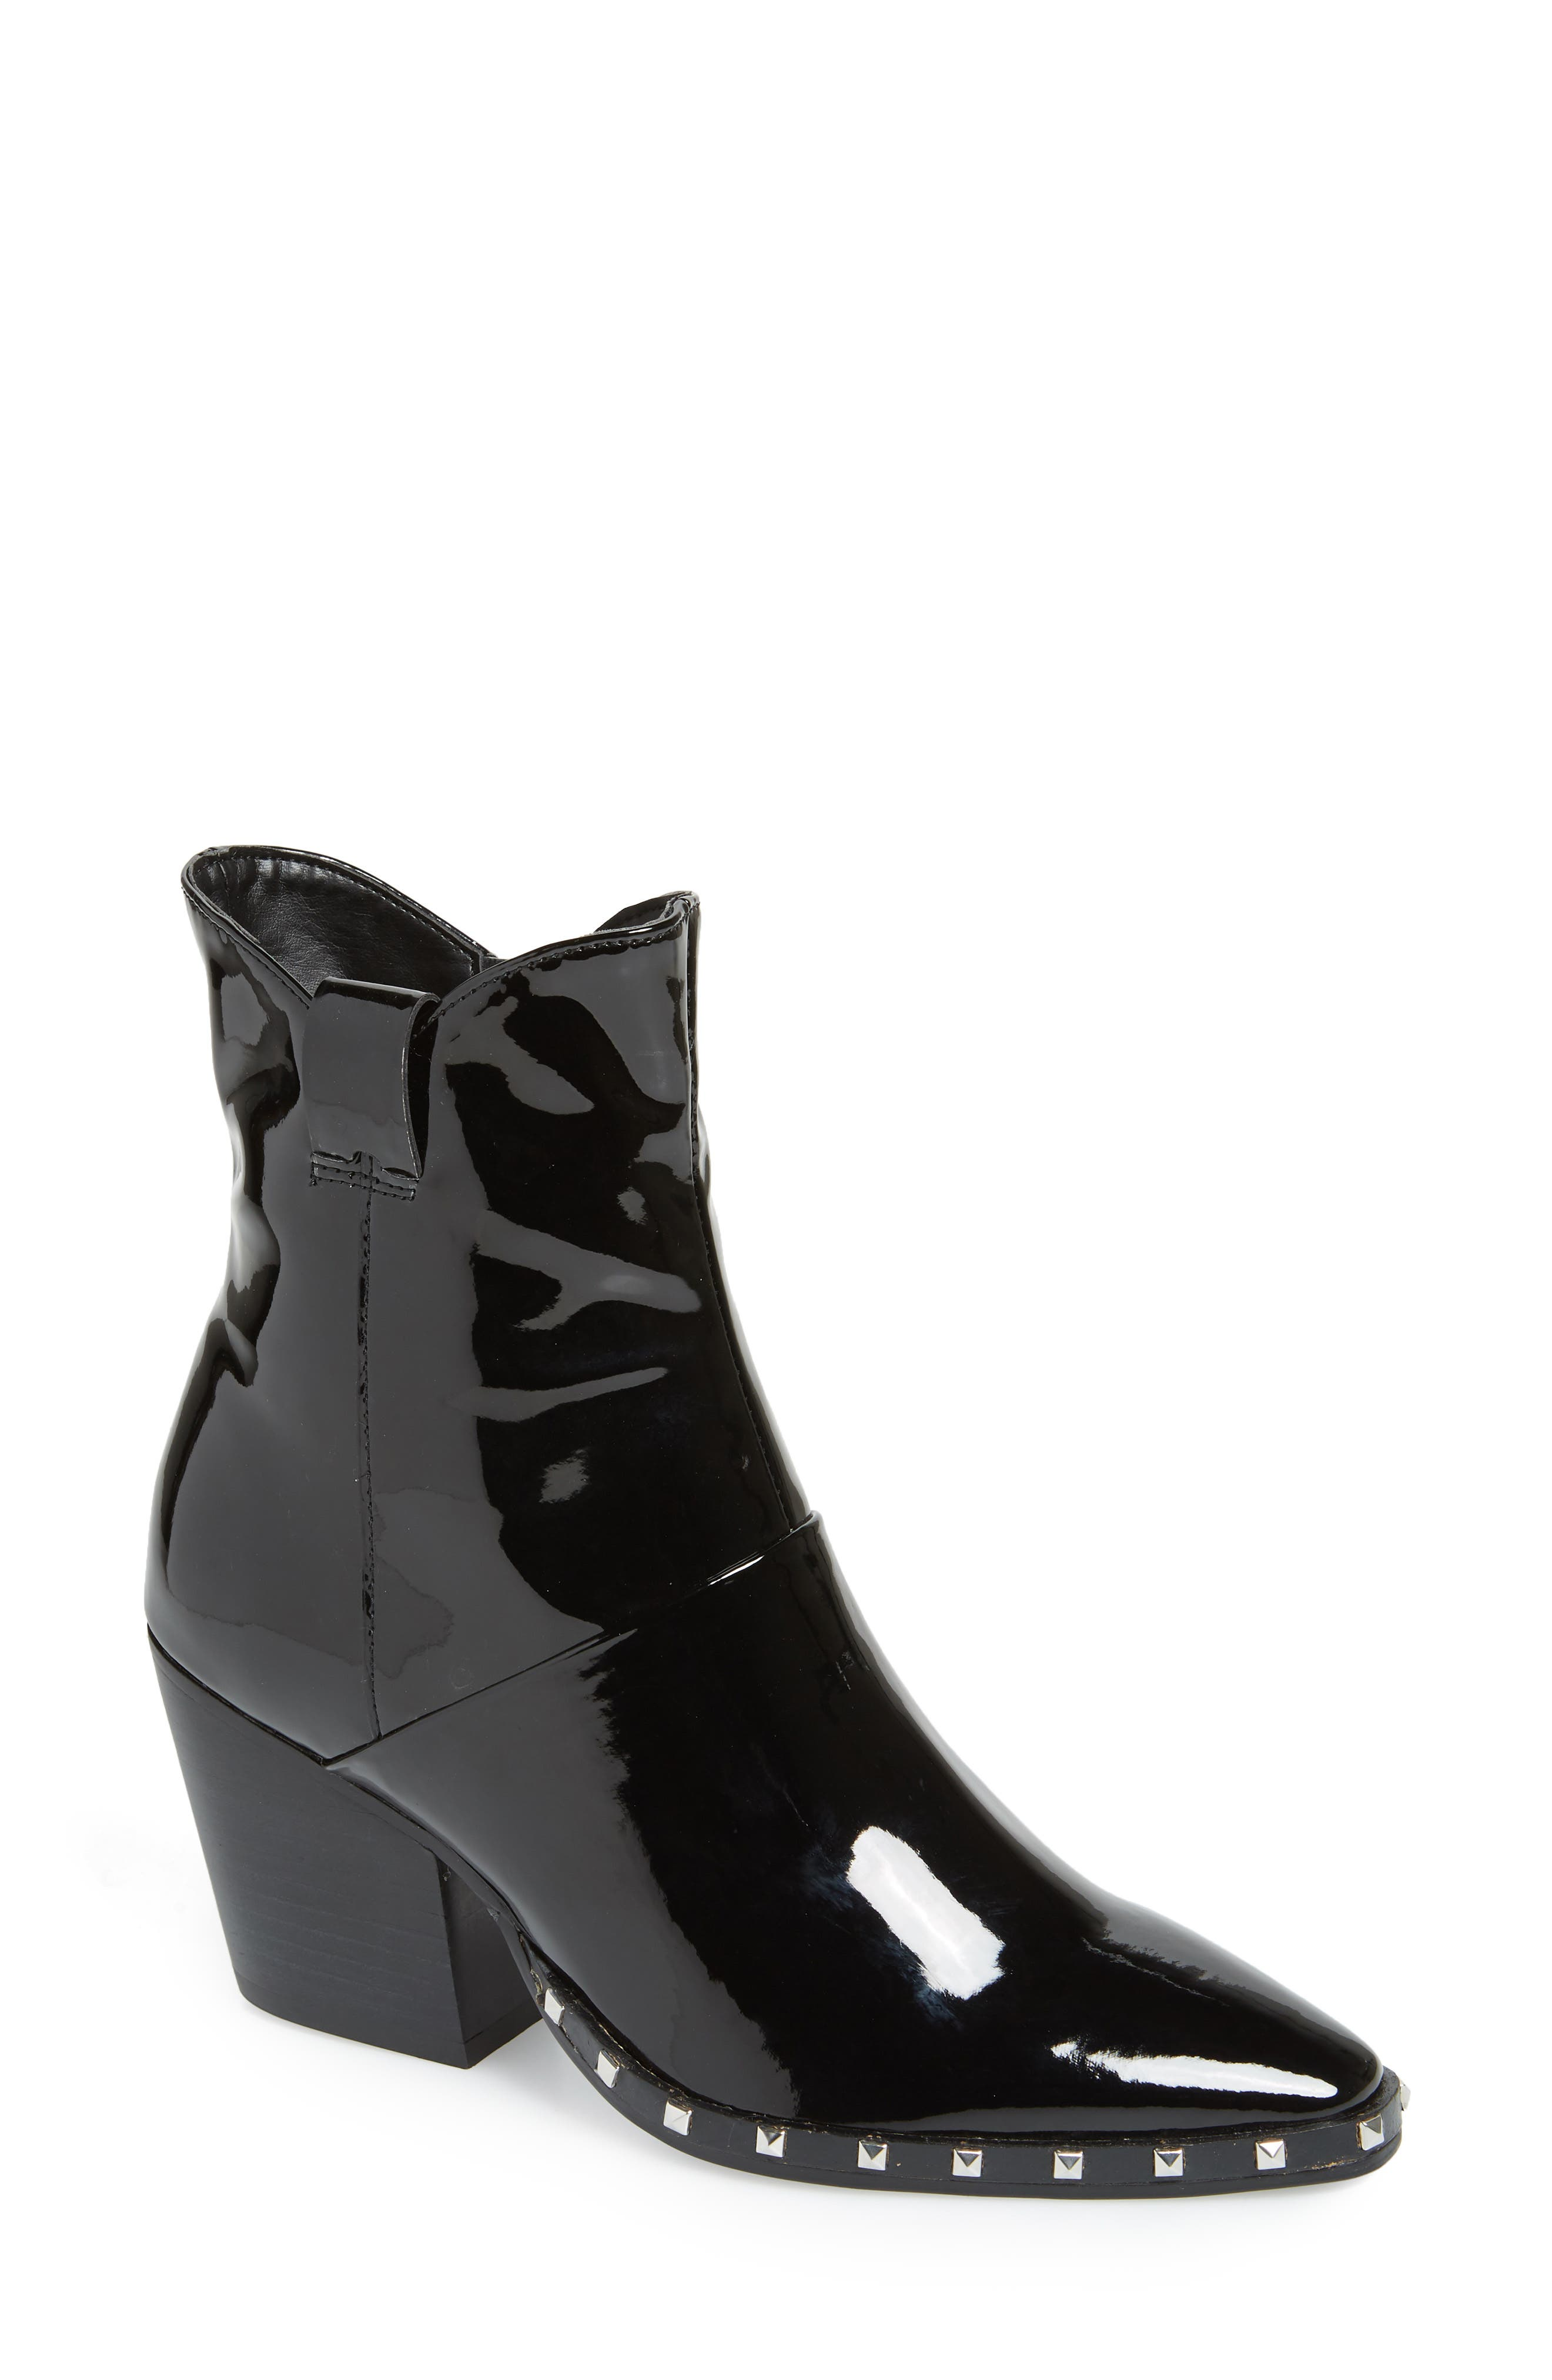 Tony Bianco Haines Studded Bootie- Black